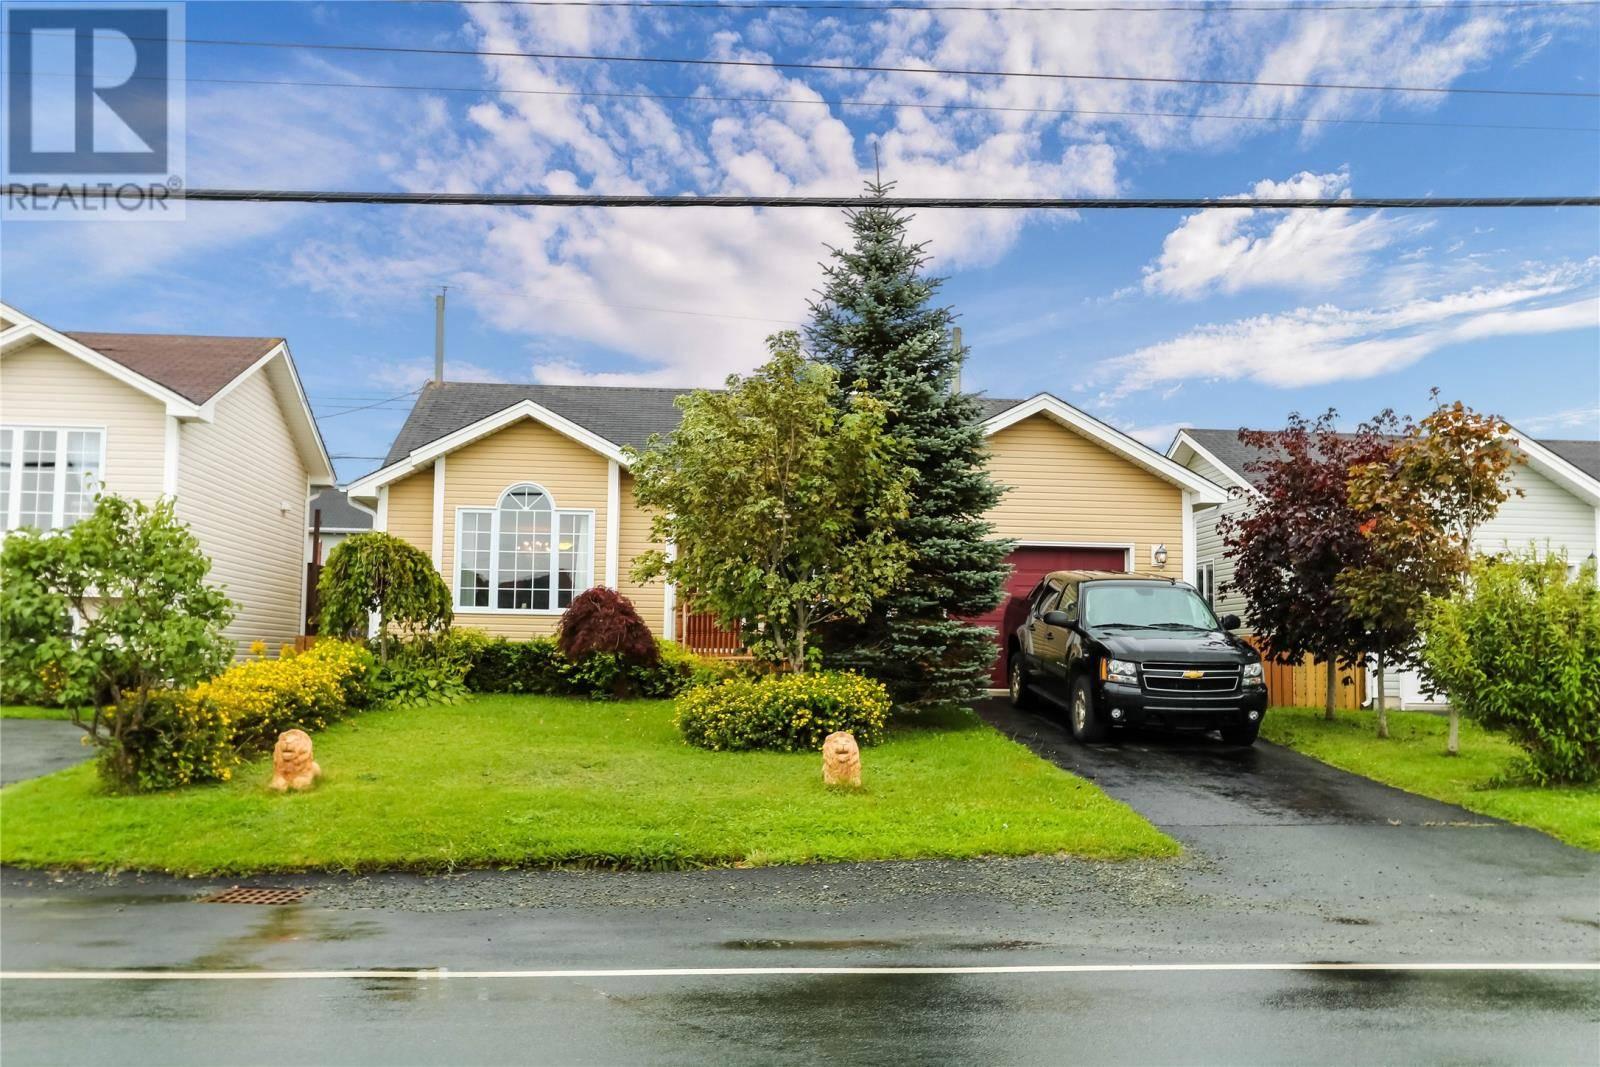 House for sale at 65 Old Bay Bulls Rd St. John's Newfoundland - MLS: 1207736